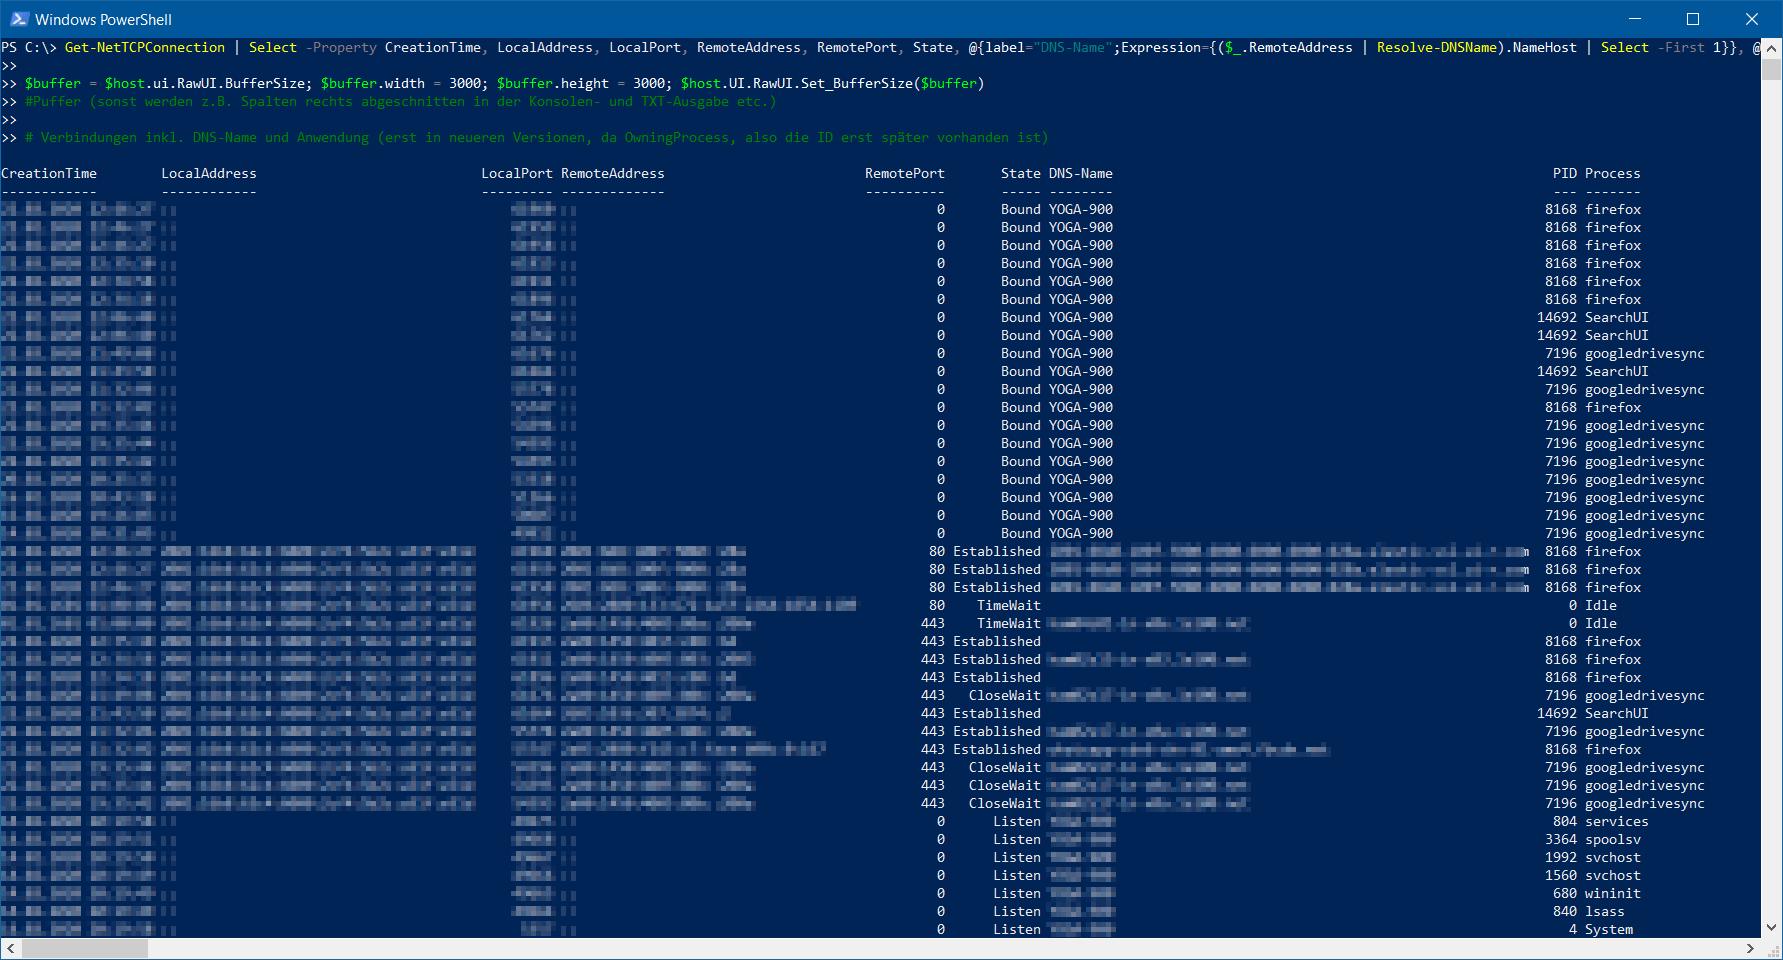 Get-NetTCPConnection - Verbindungen per PowerShell inkl. DNS-Name und Anwendung